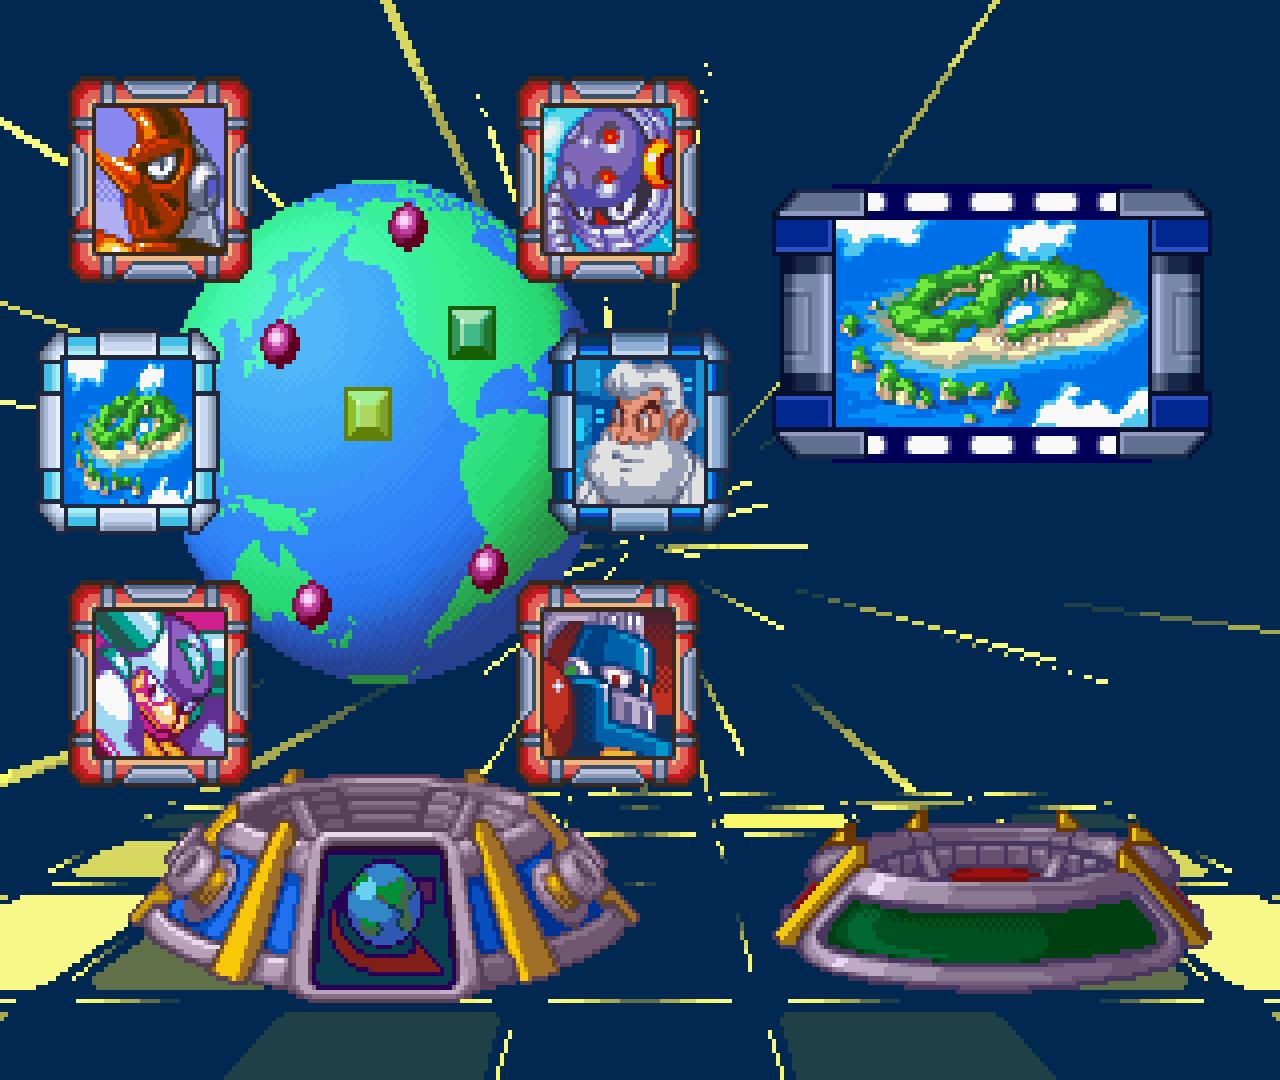 Figure 7 - The level select menu in Mega Man 8